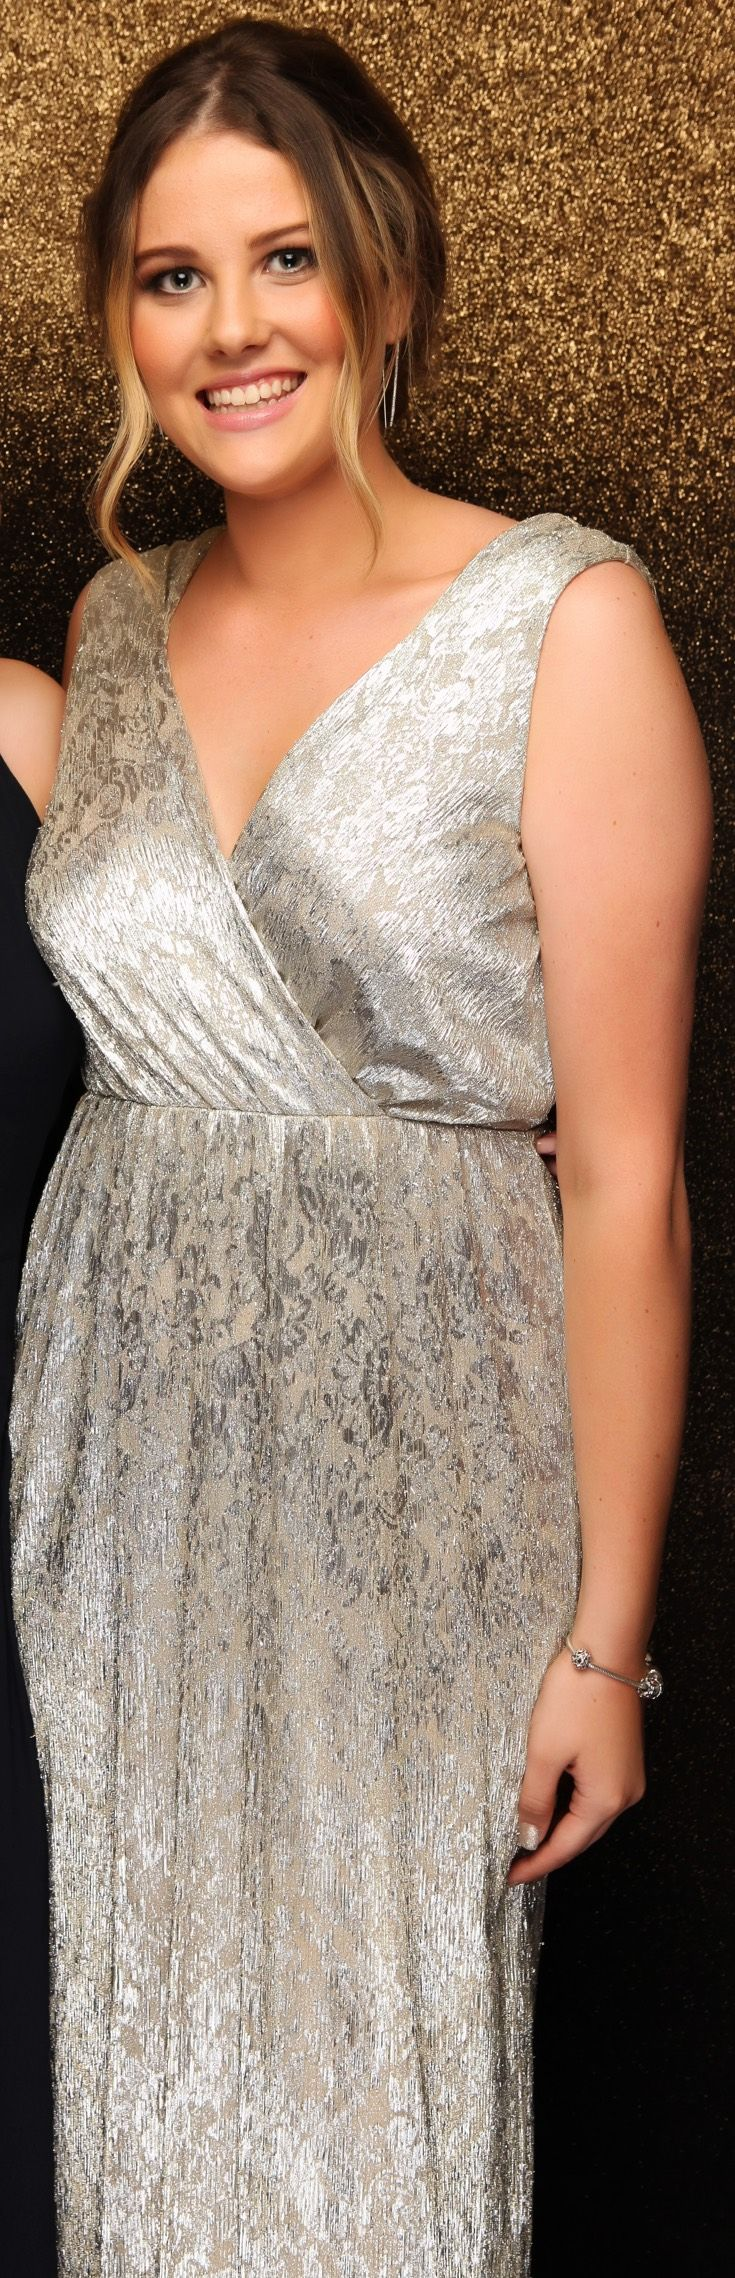 Whangaparaoa Ball 2015. Incredible gown! www.whitedoor.co.nz